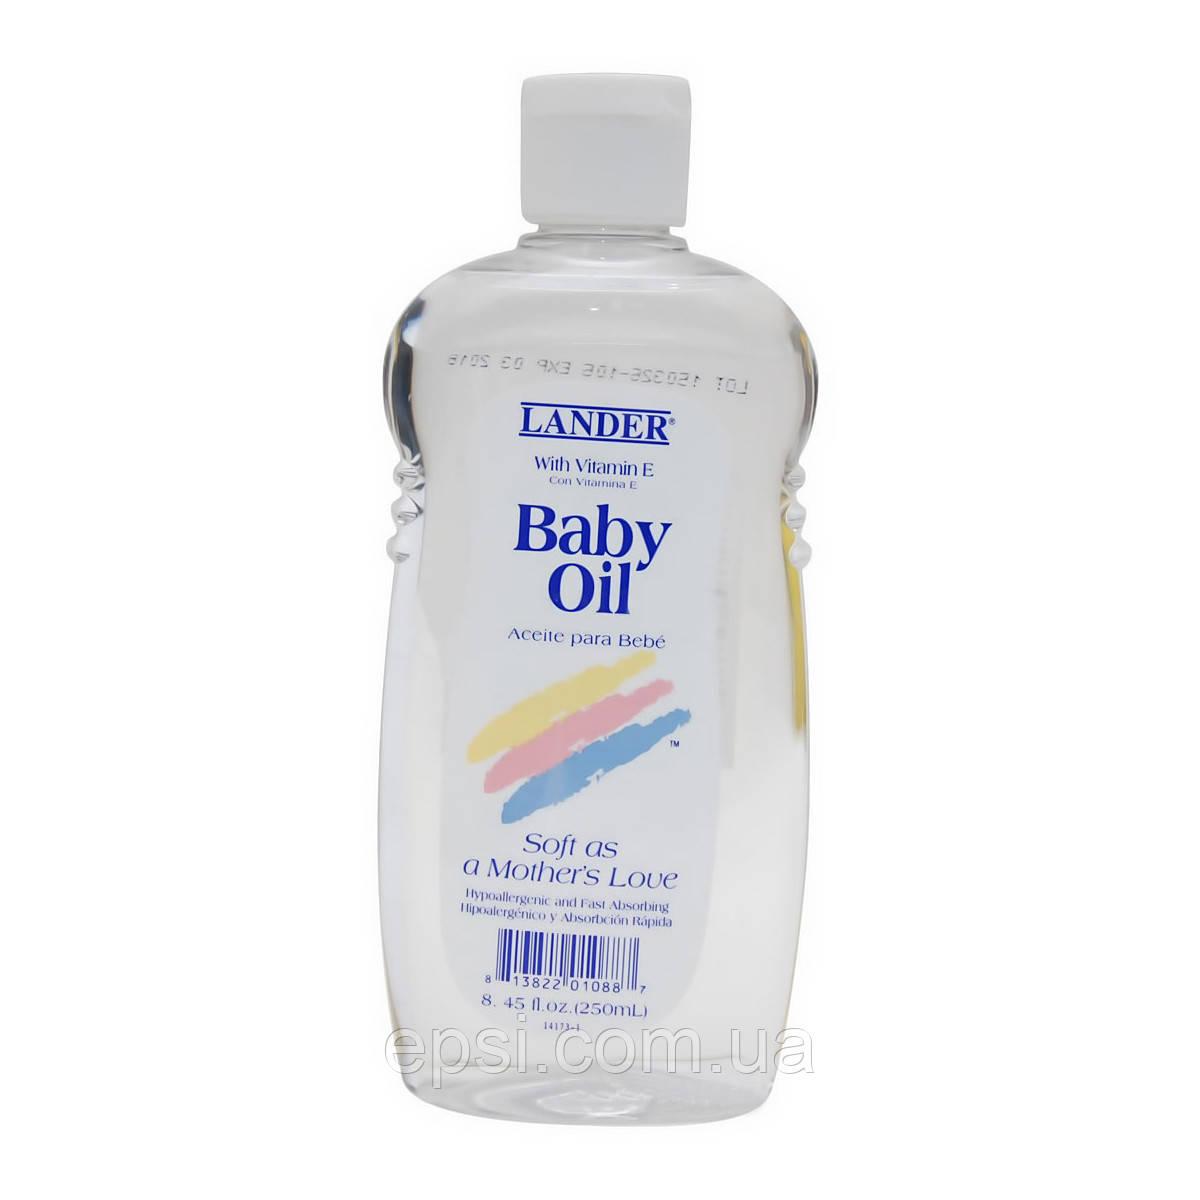 Дитяче масло для тіла Lander Baby Oil with vitamin E, 250 мл